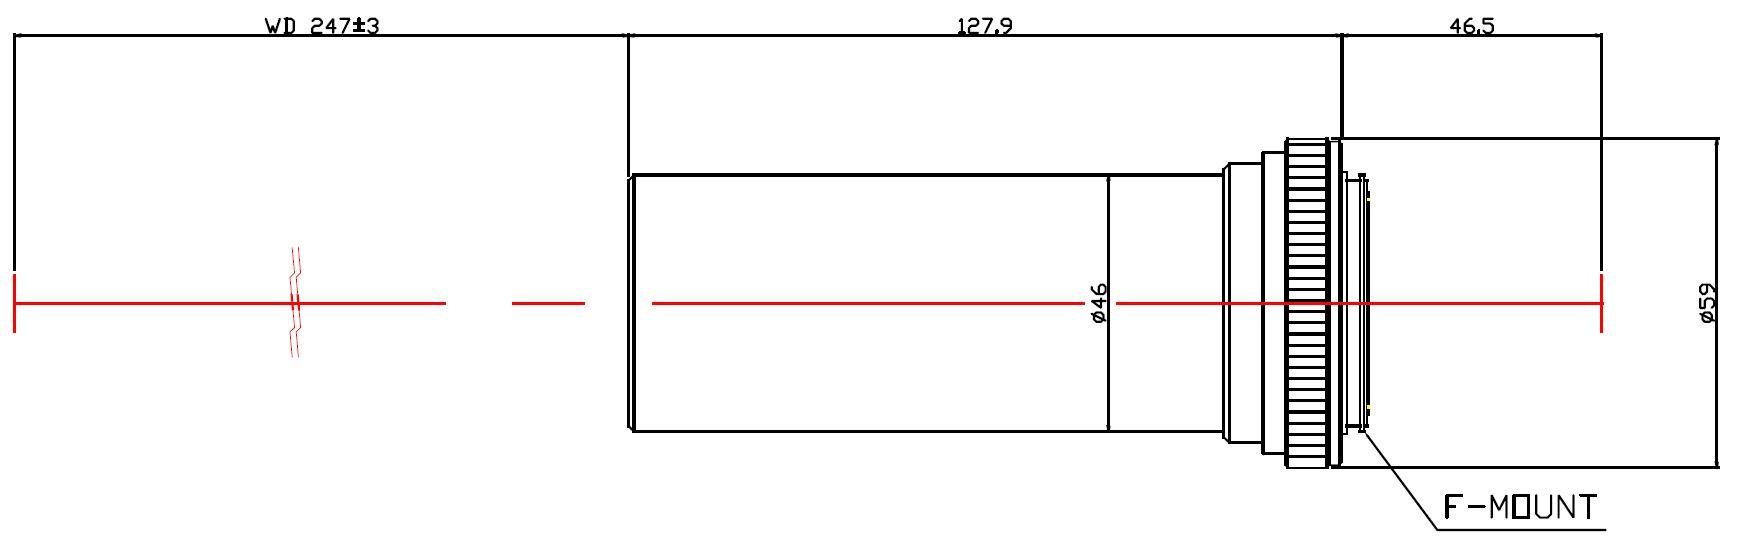 Lensagon MF8M-074-247